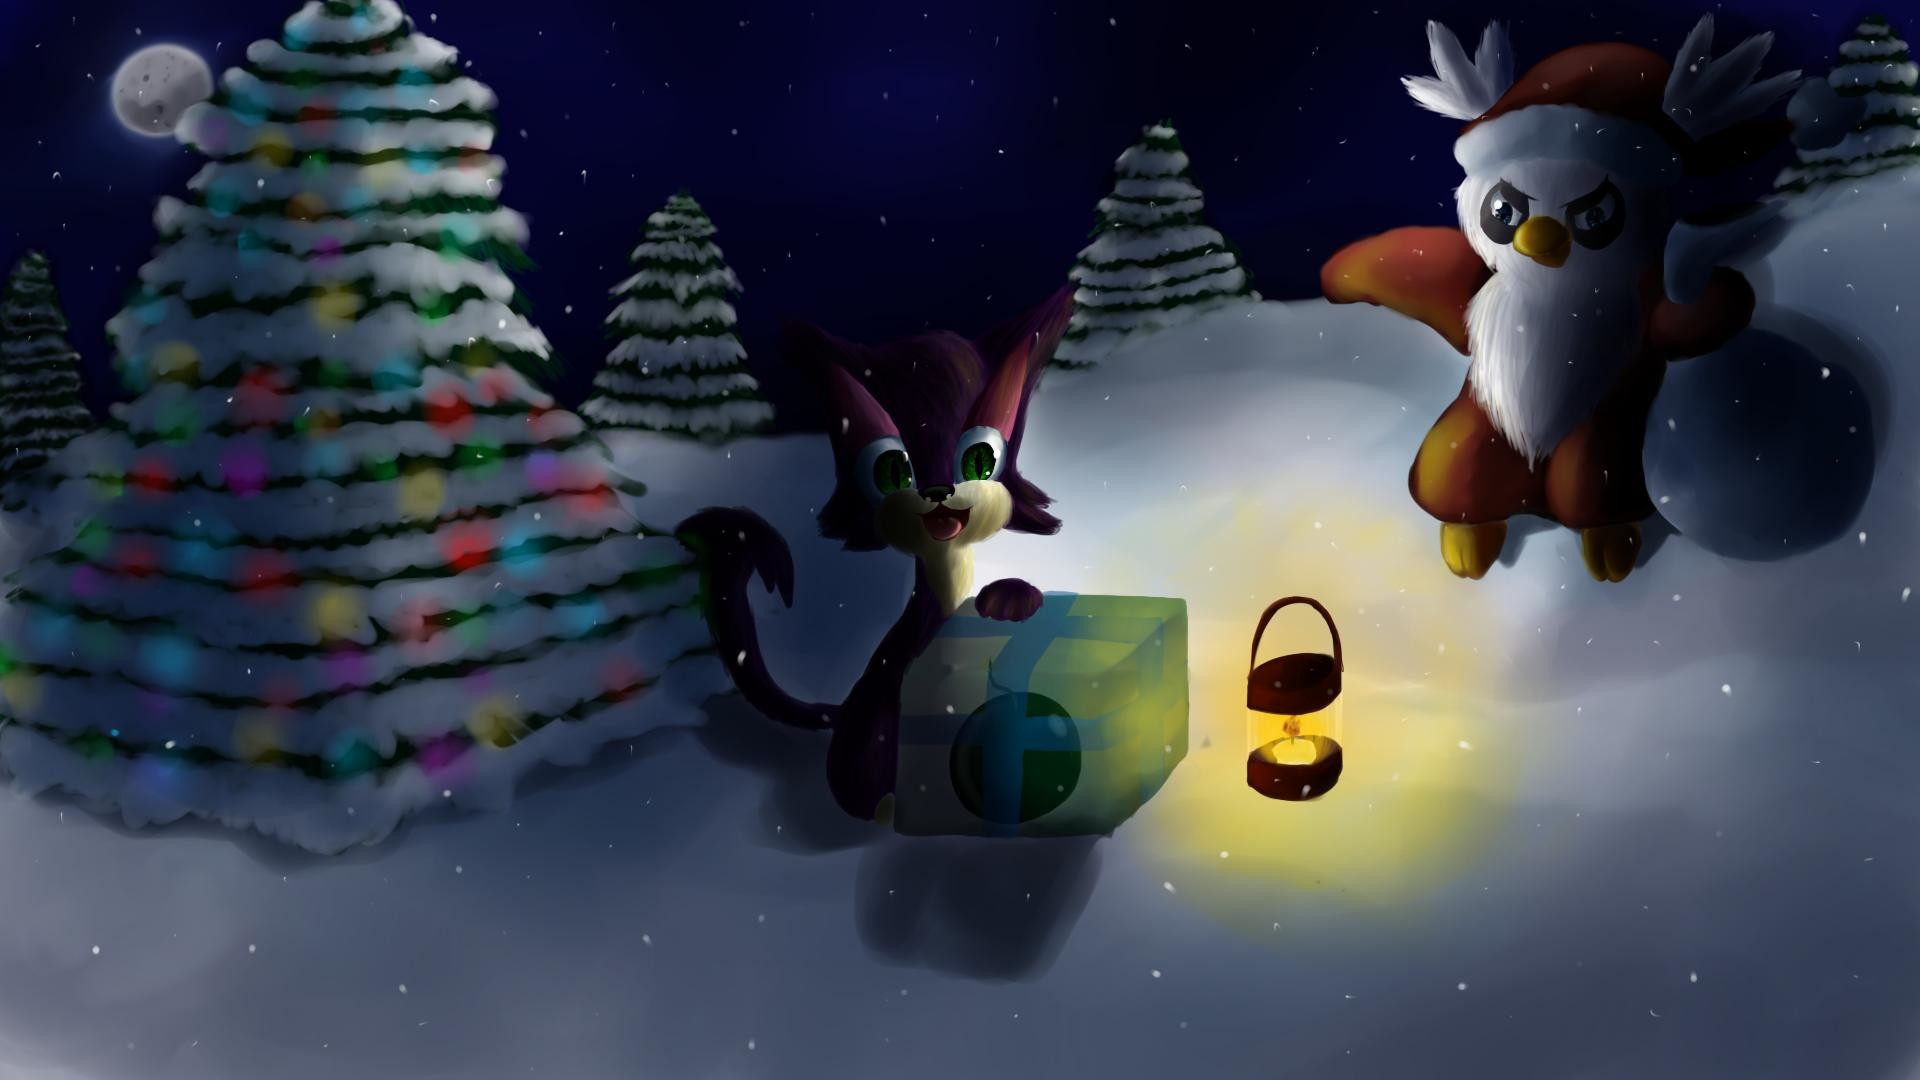 Bad Santa ~Christmas Pokemon Wallpaper~ by Chicorii on DeviantArt